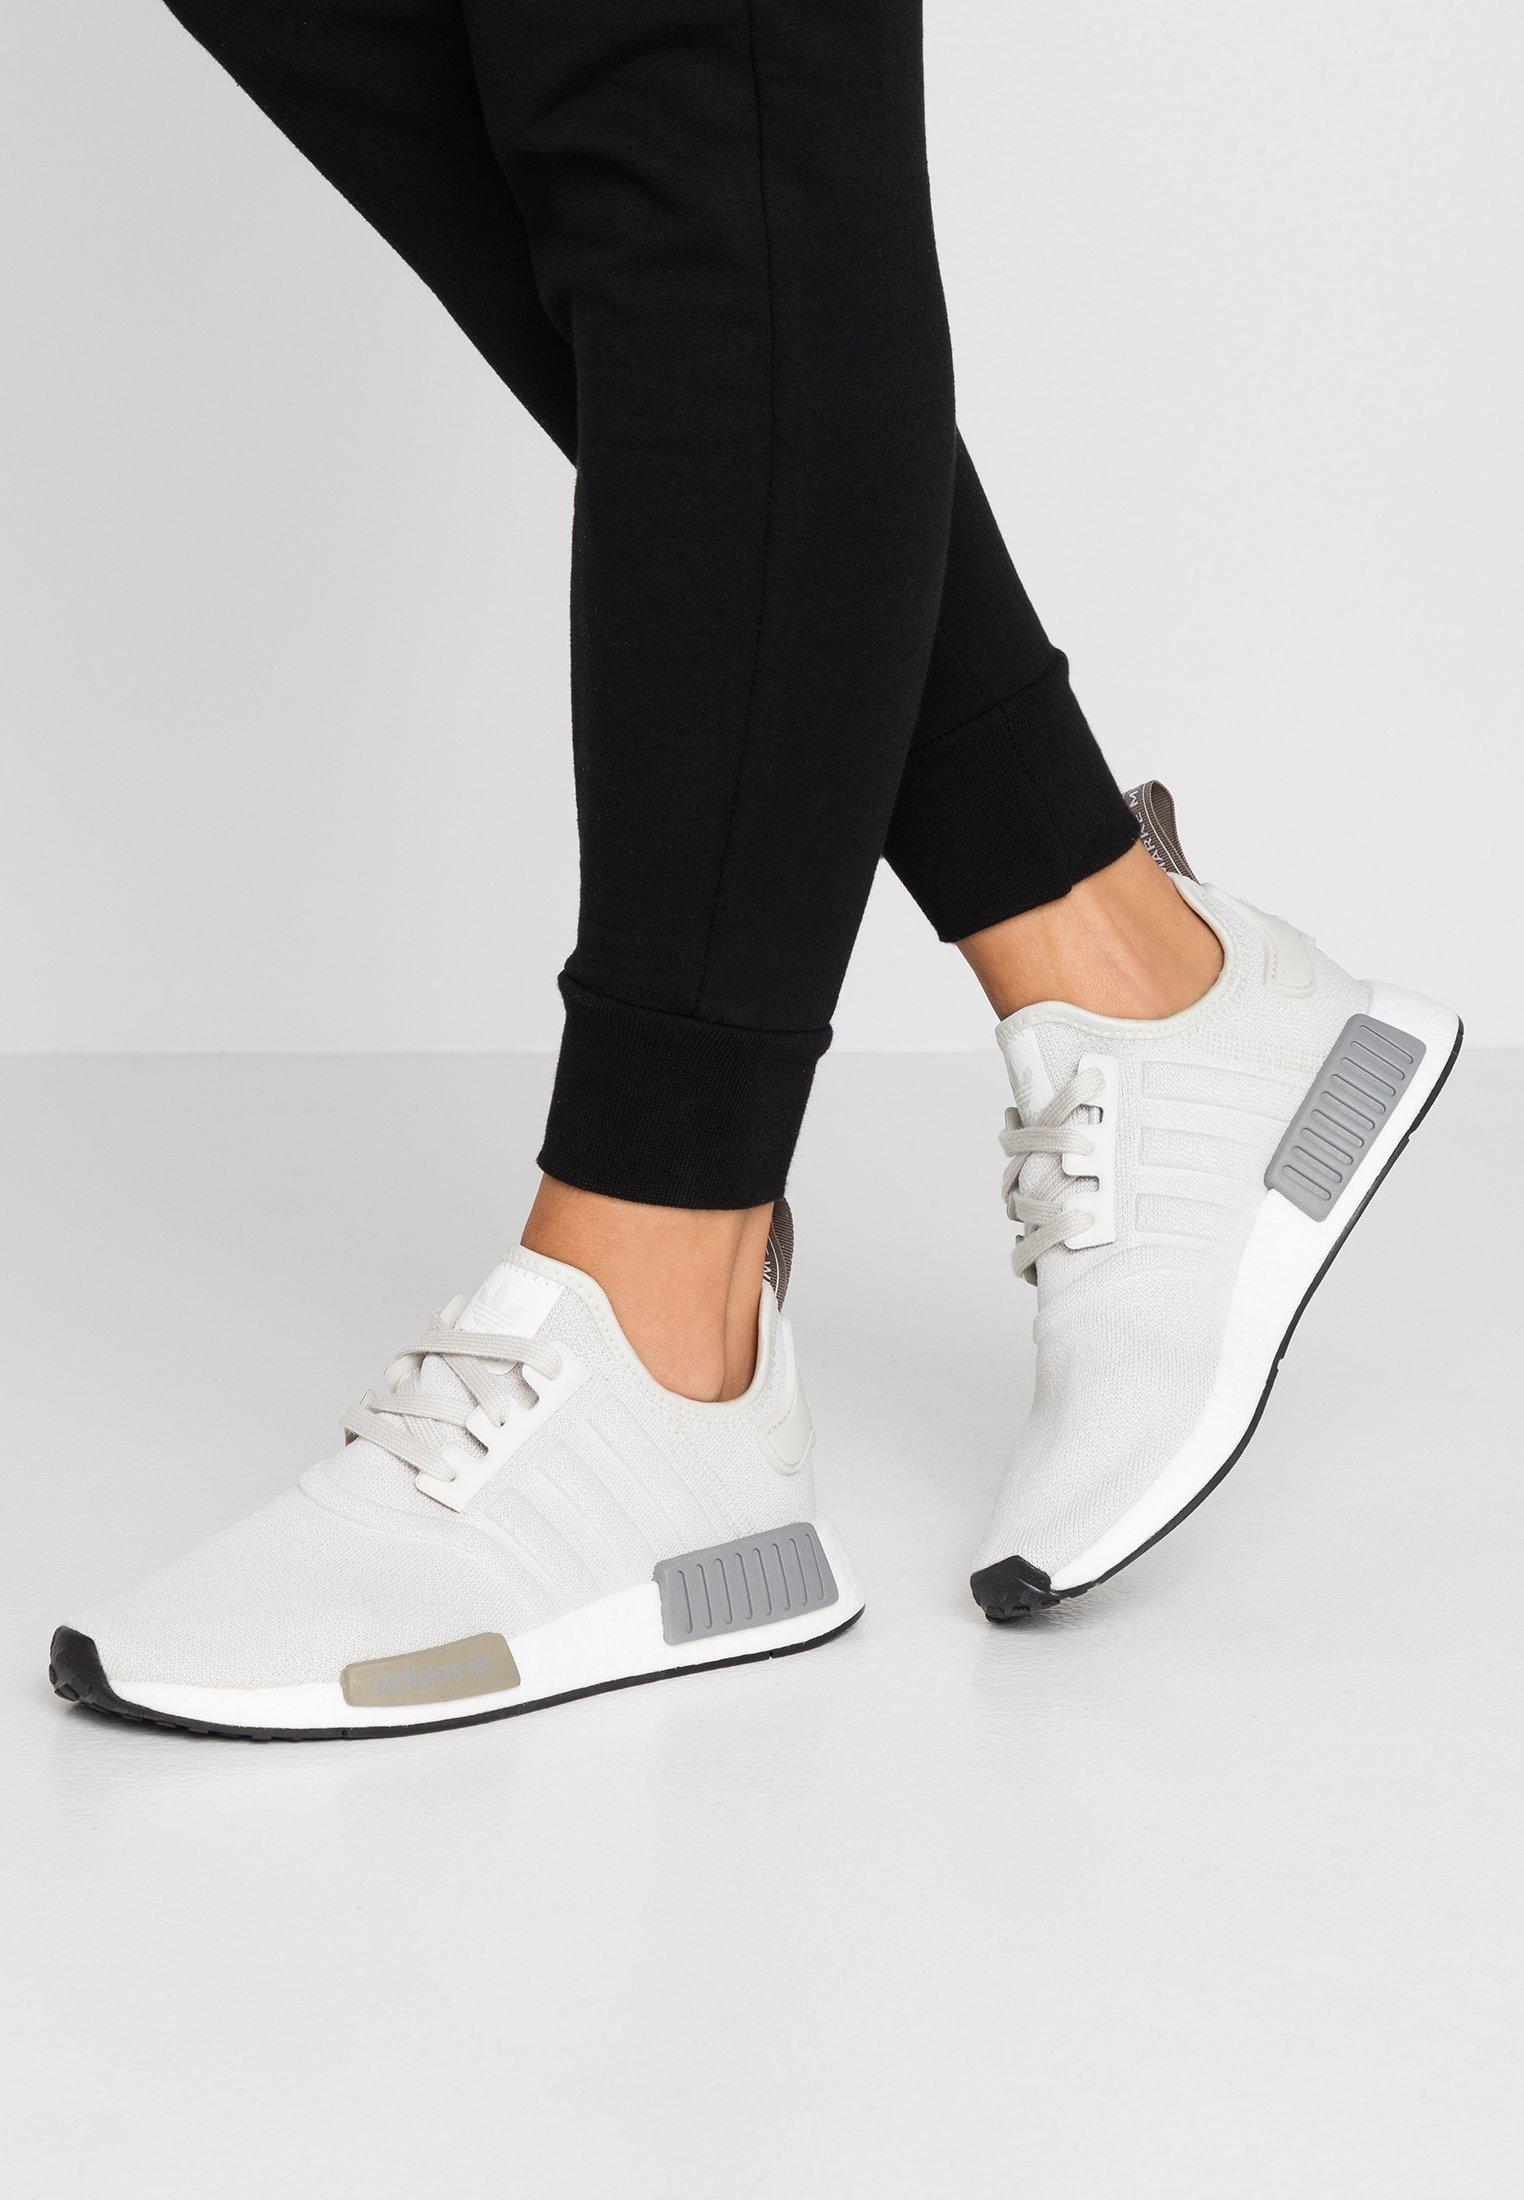 Soldes > adidas nmd r1 v2 zalando > en stock